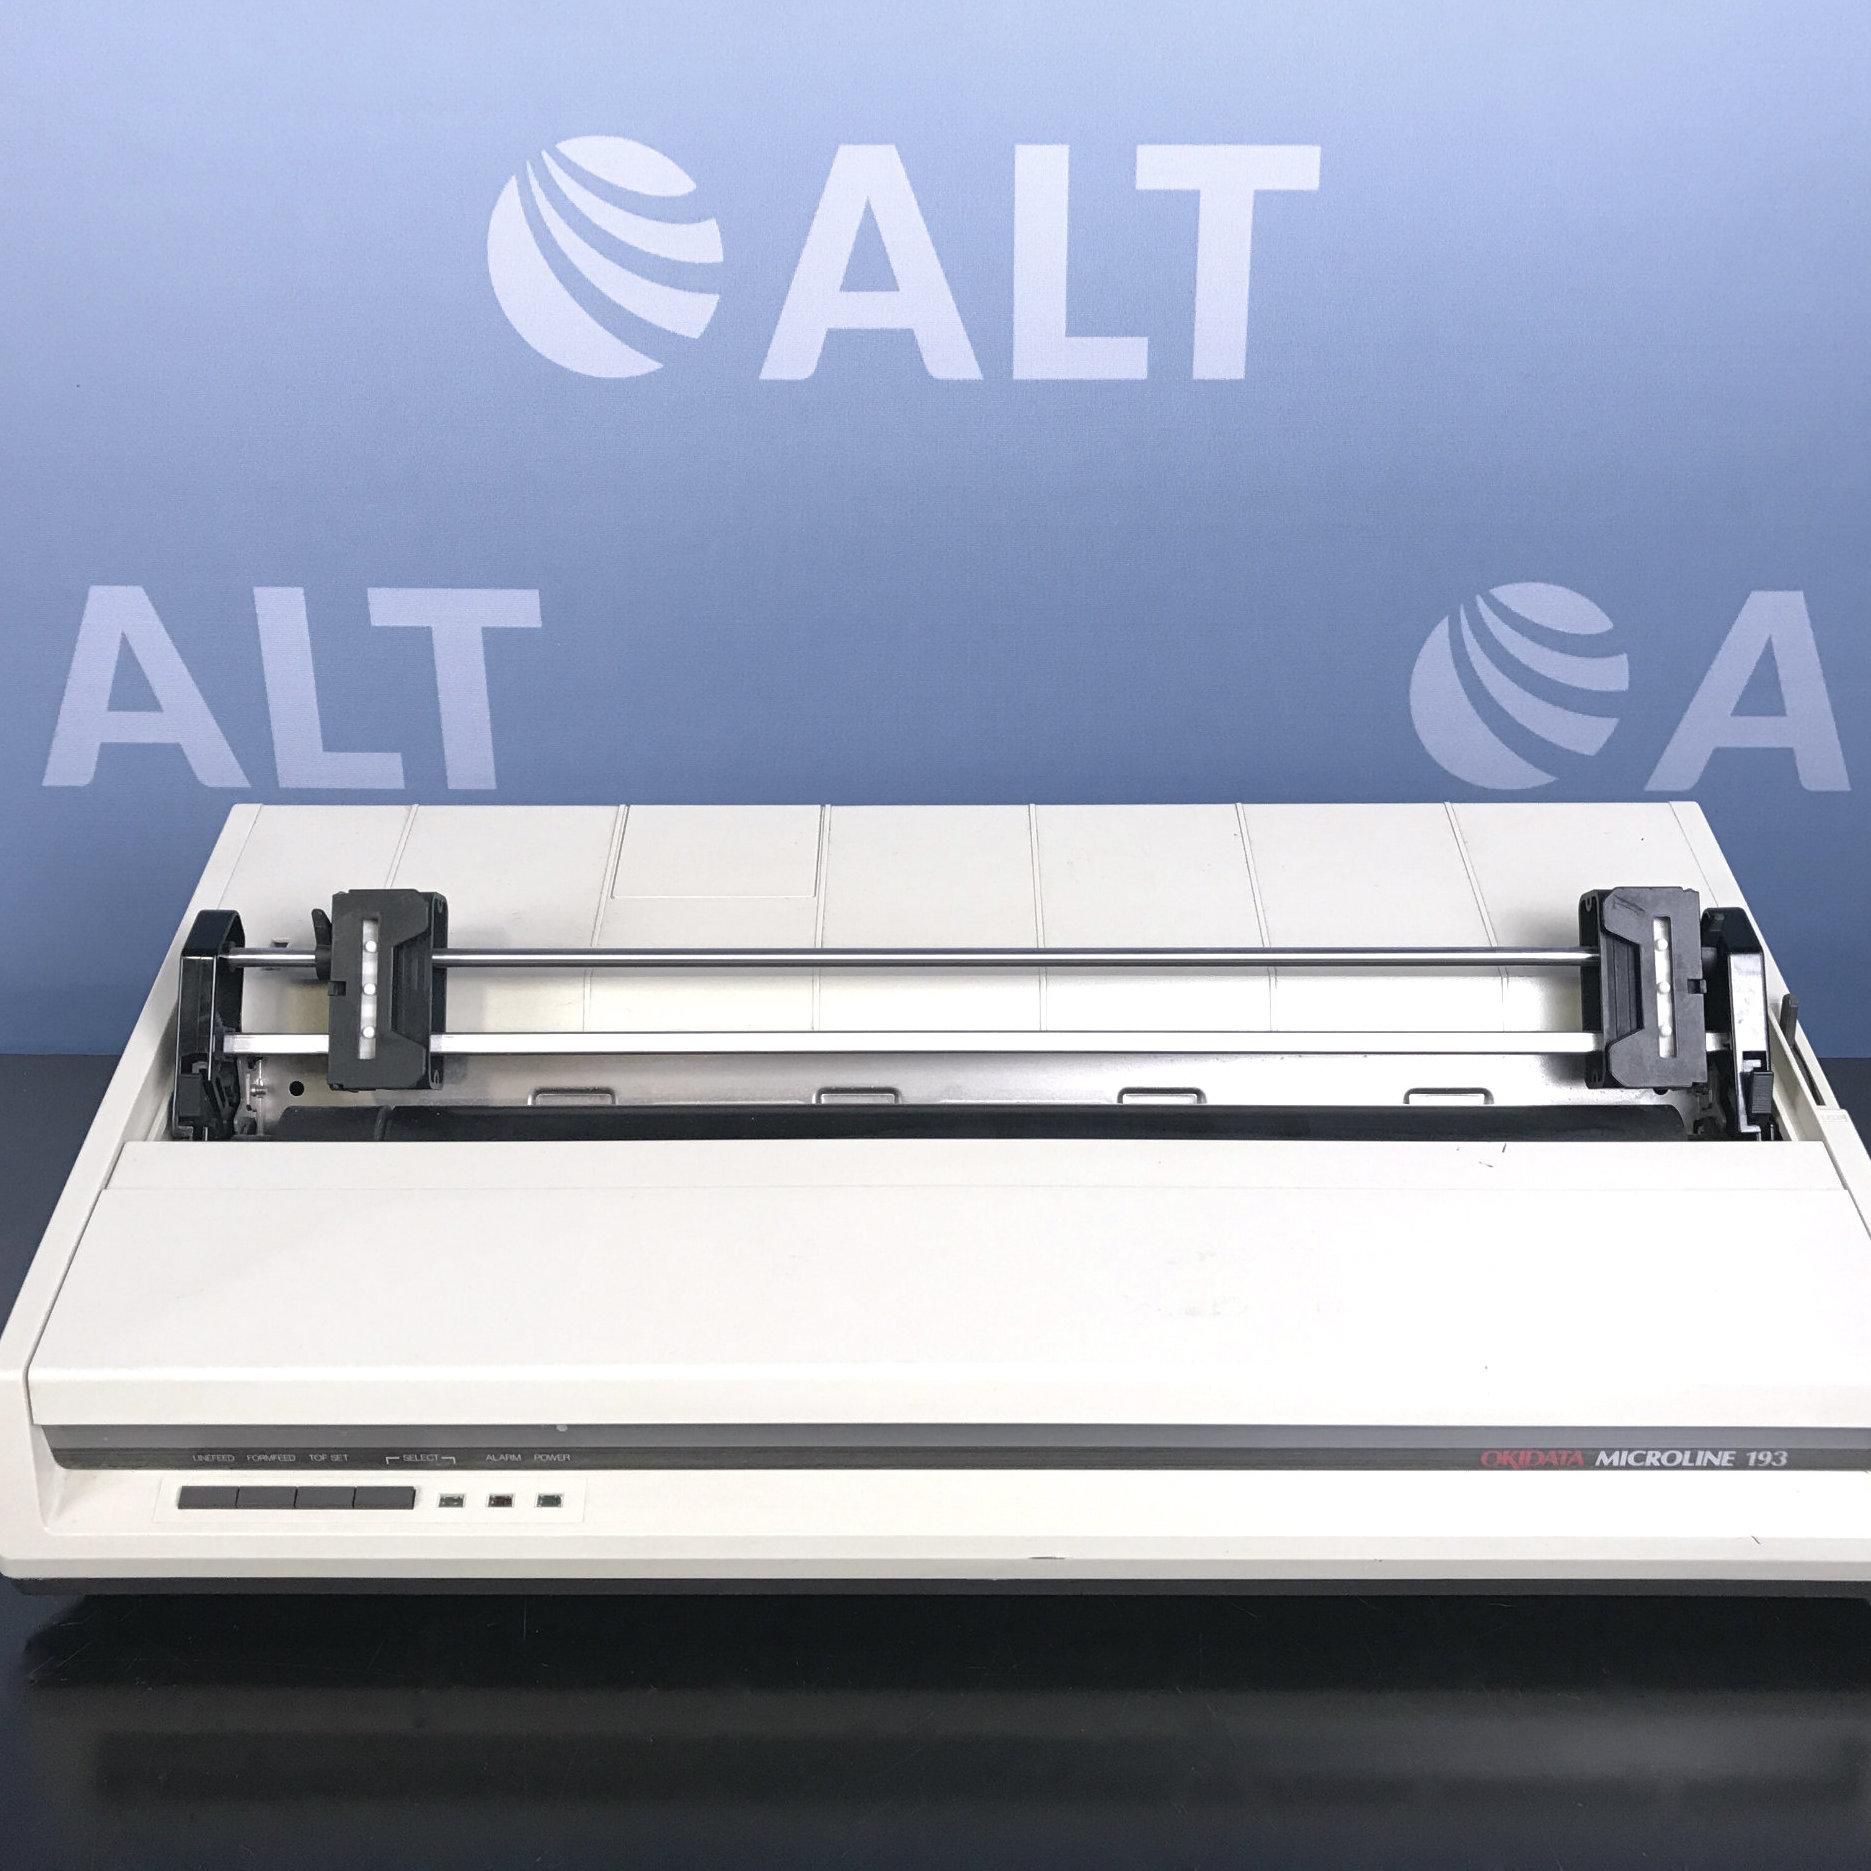 Okidata Microline 193 Printer Model:GE8251B  Image